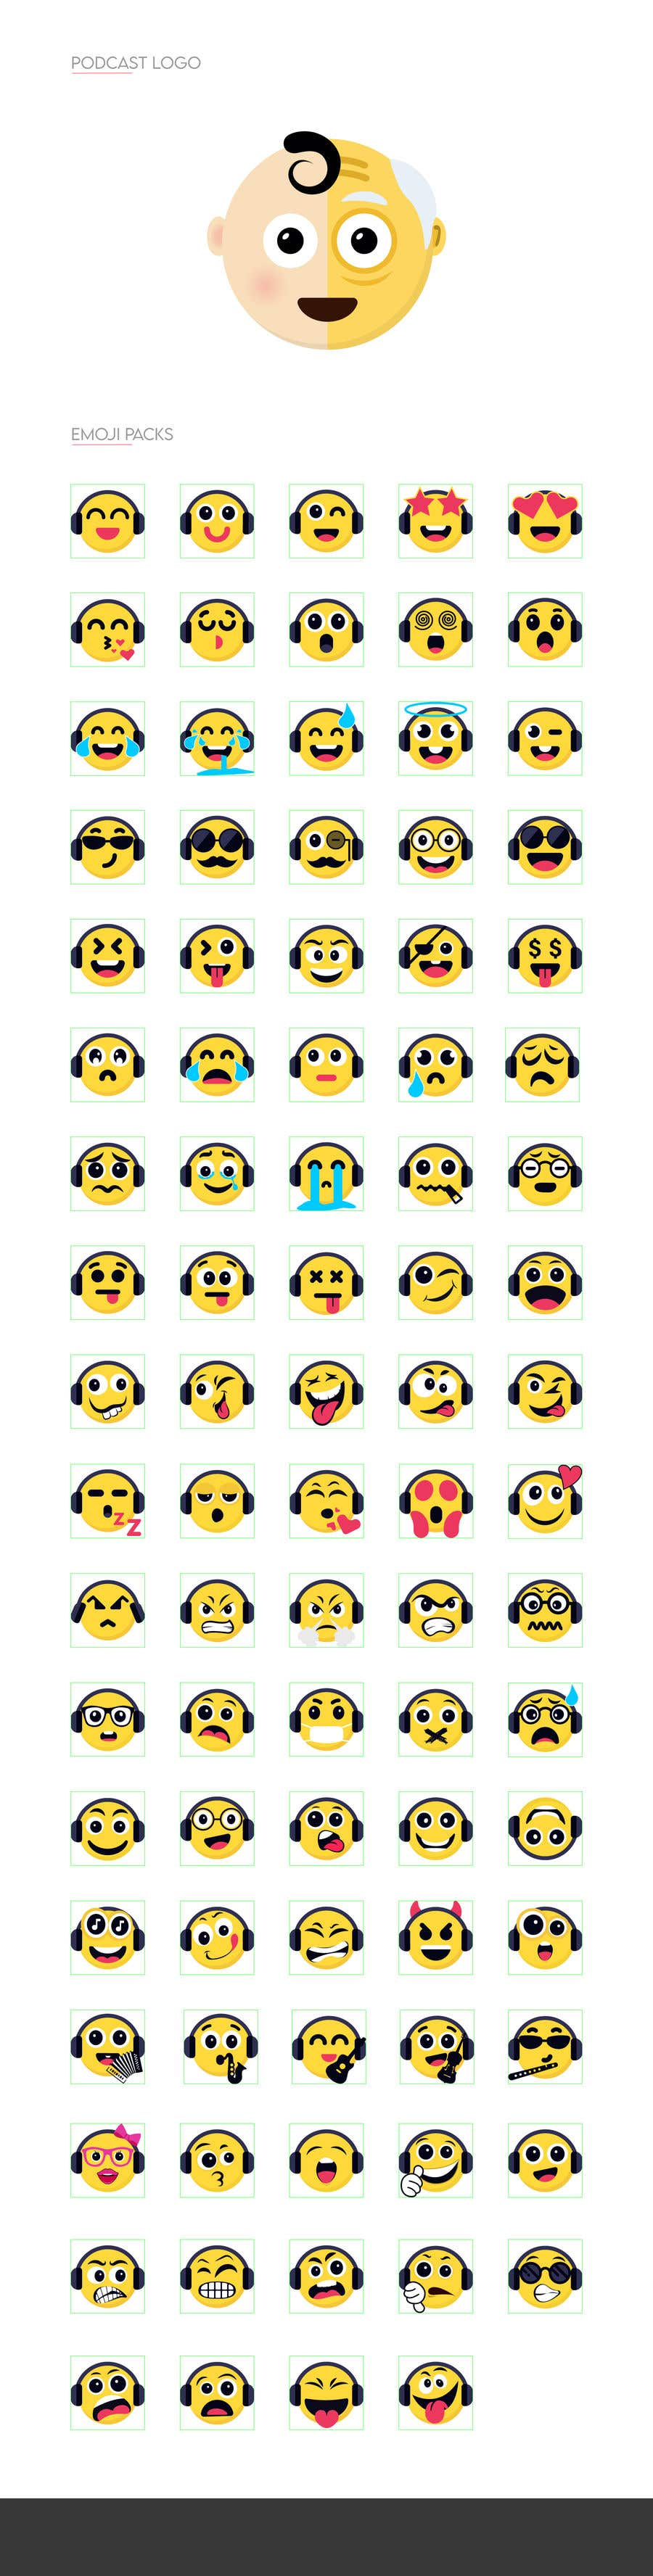 Bài tham dự cuộc thi #                                        202                                      cho                                         Design custom emojis for a YouTube-channel's membership program